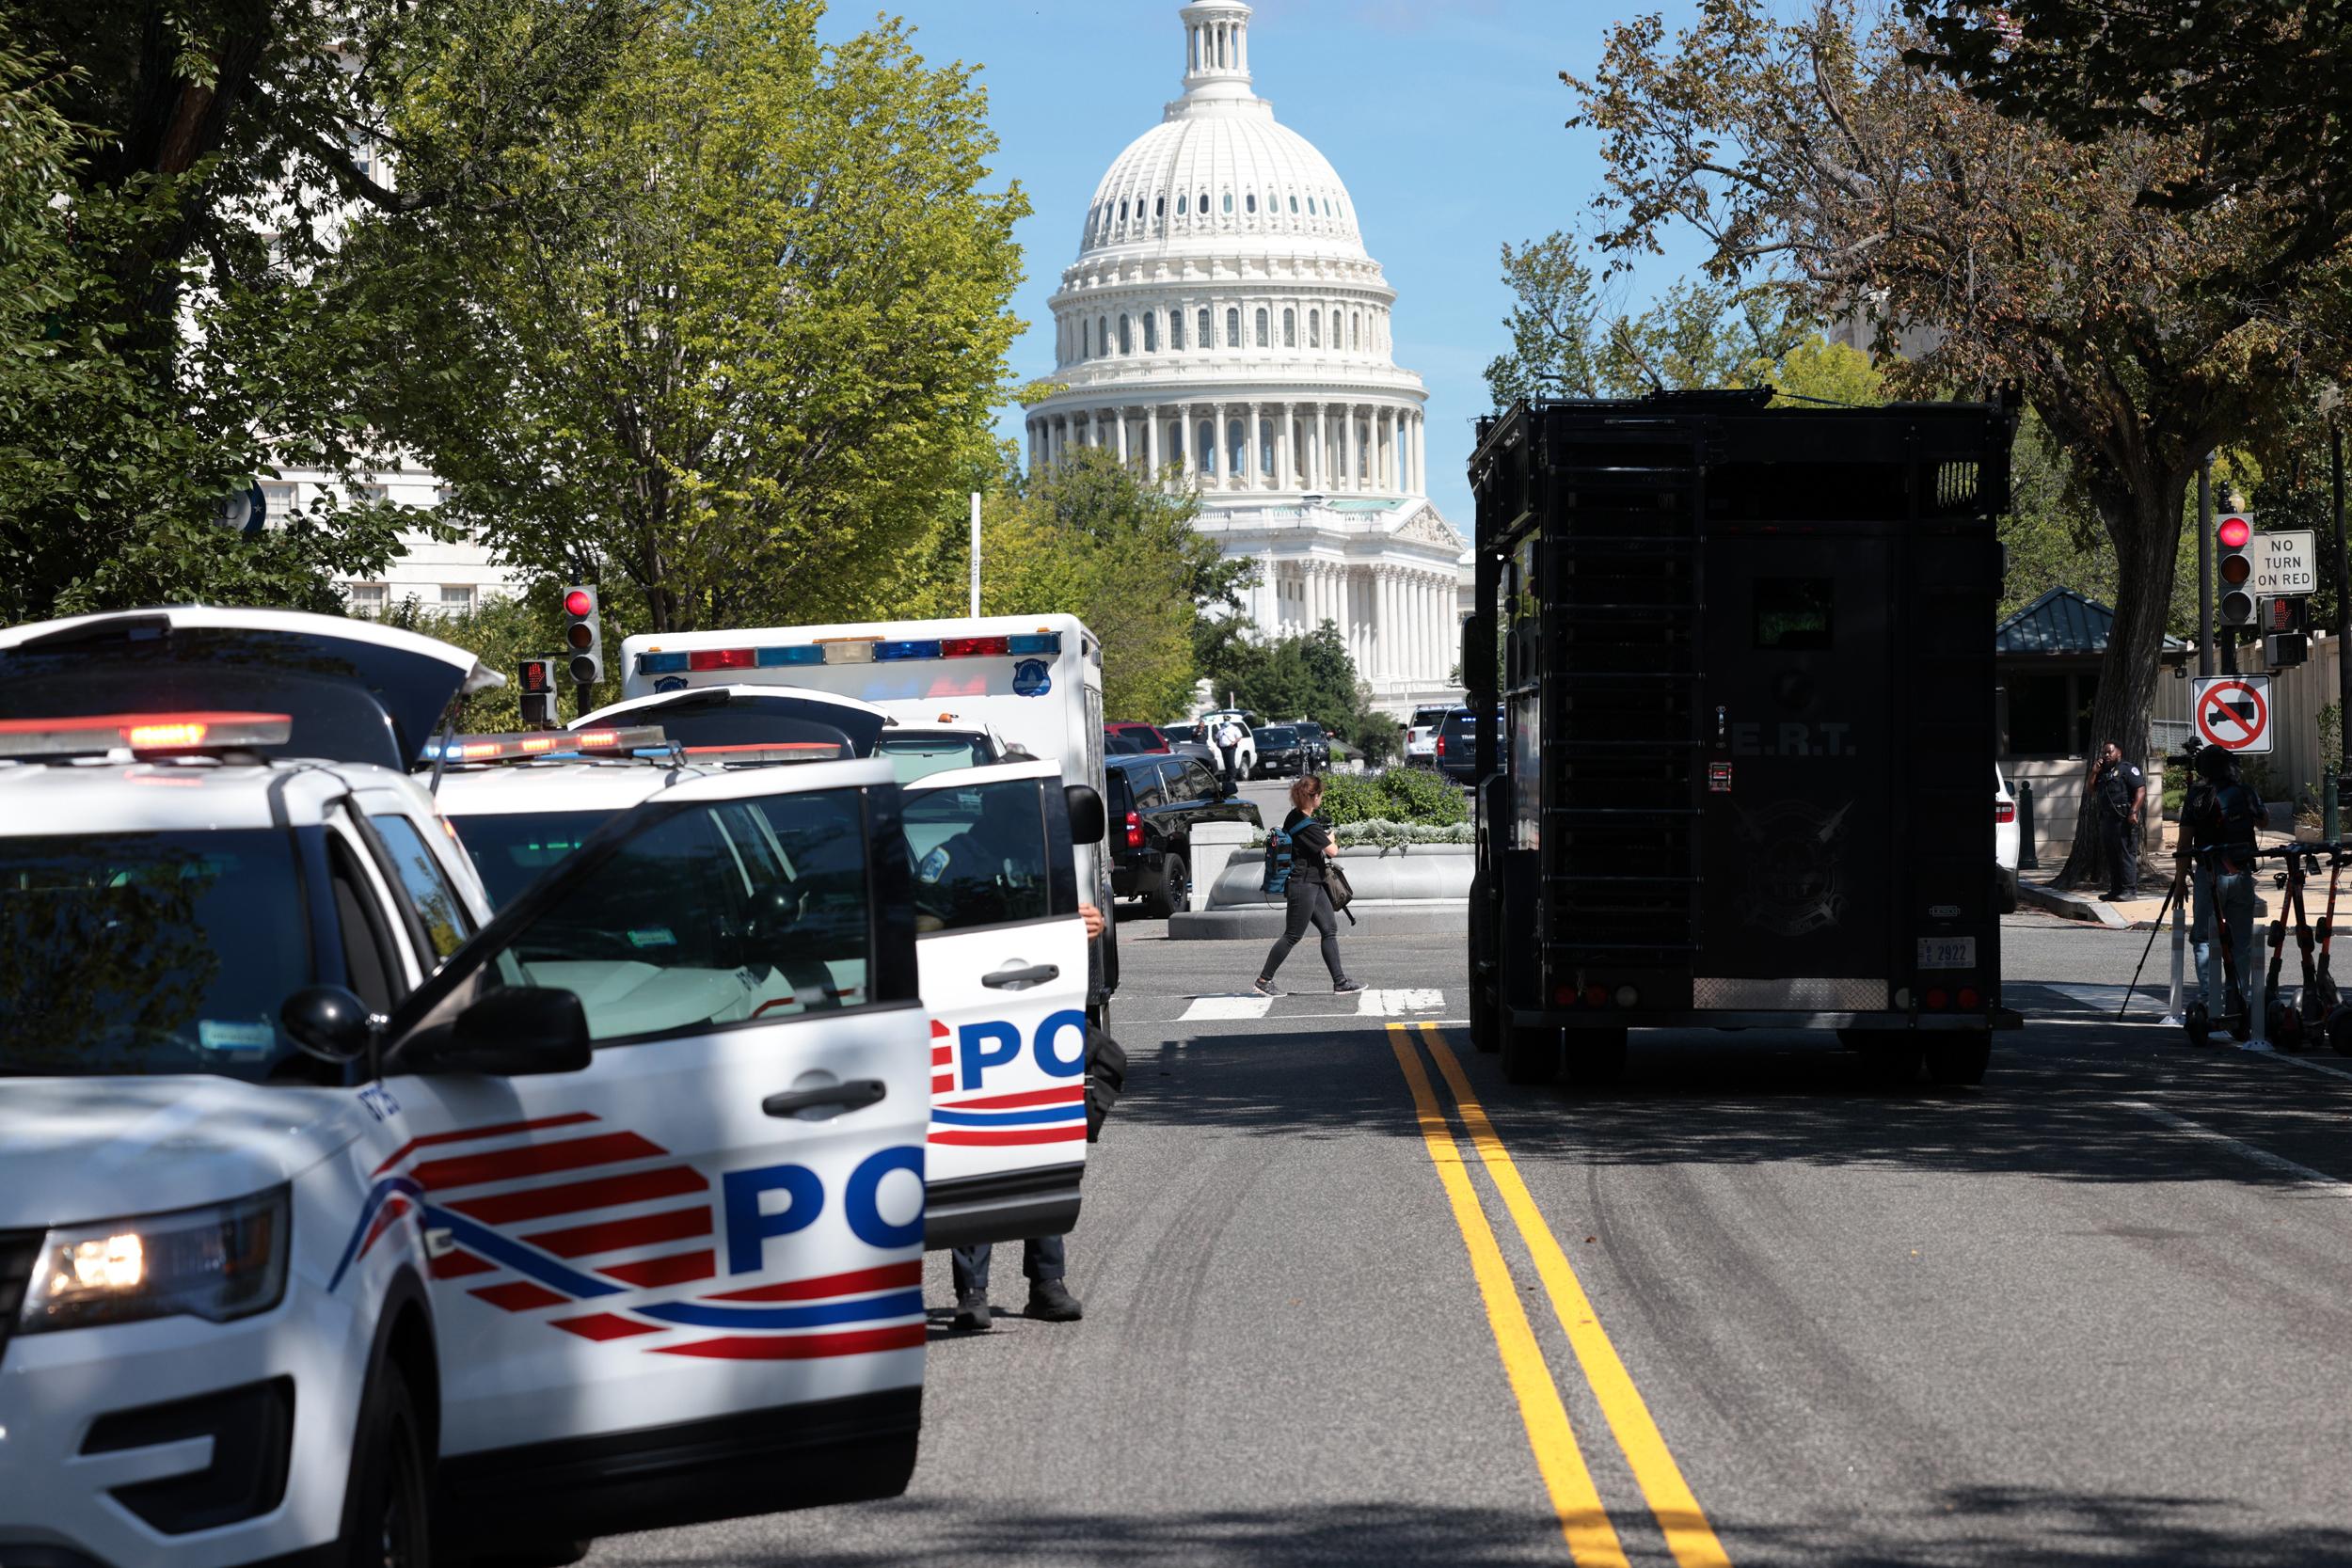 Suspect in Washington, D.C., bomb threat surrenders, is in police custody